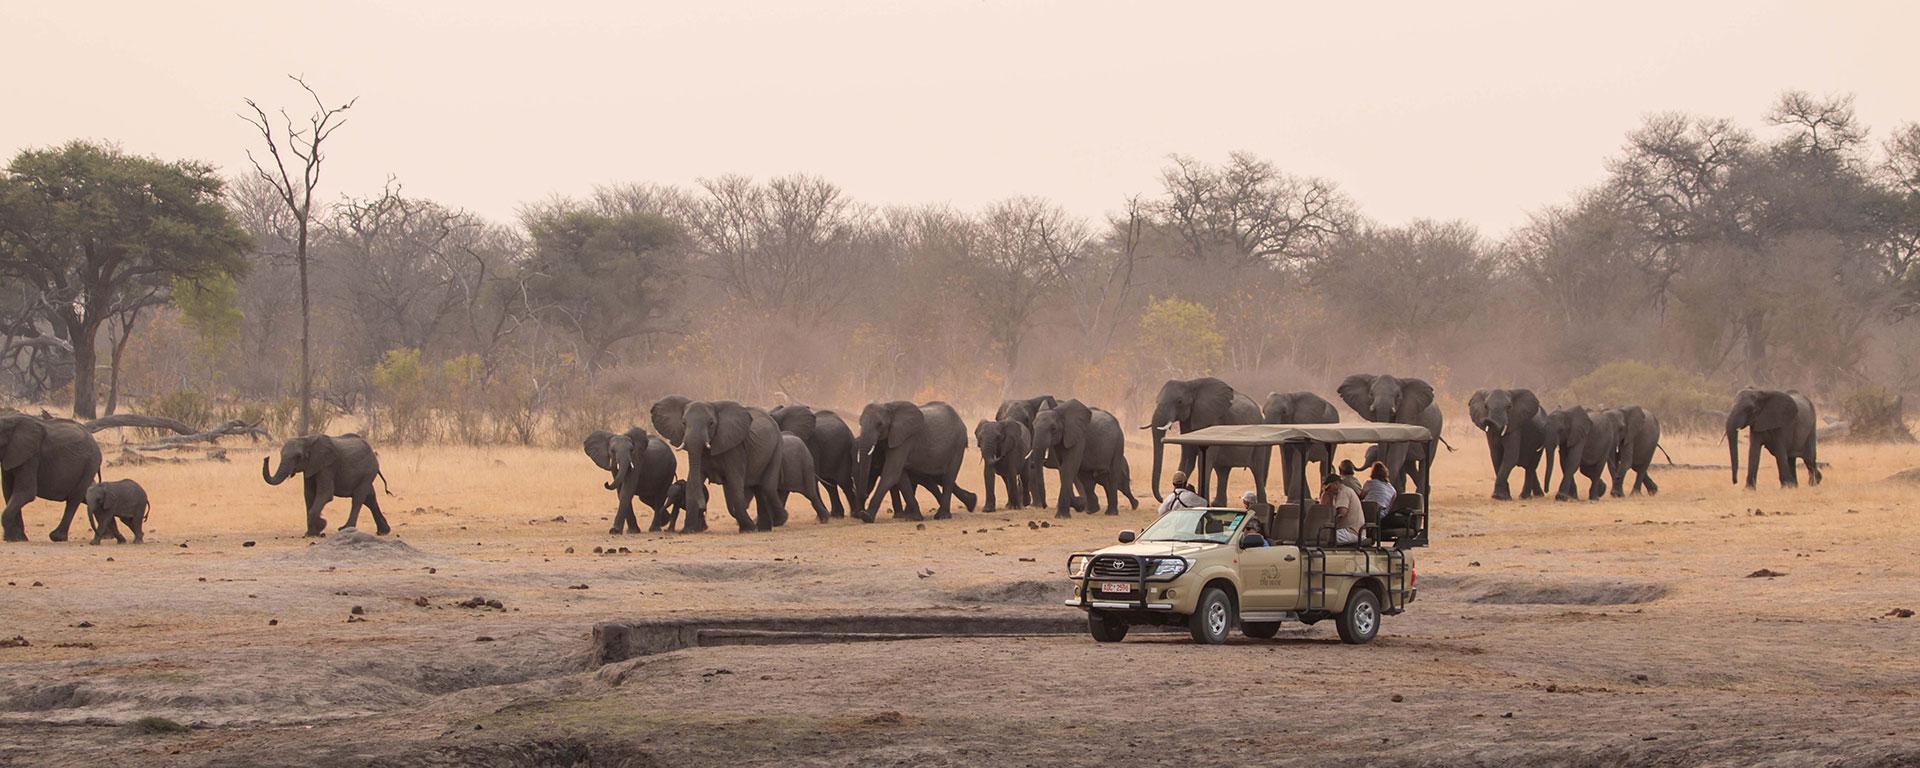 Epic Journeys On African Safari Tours